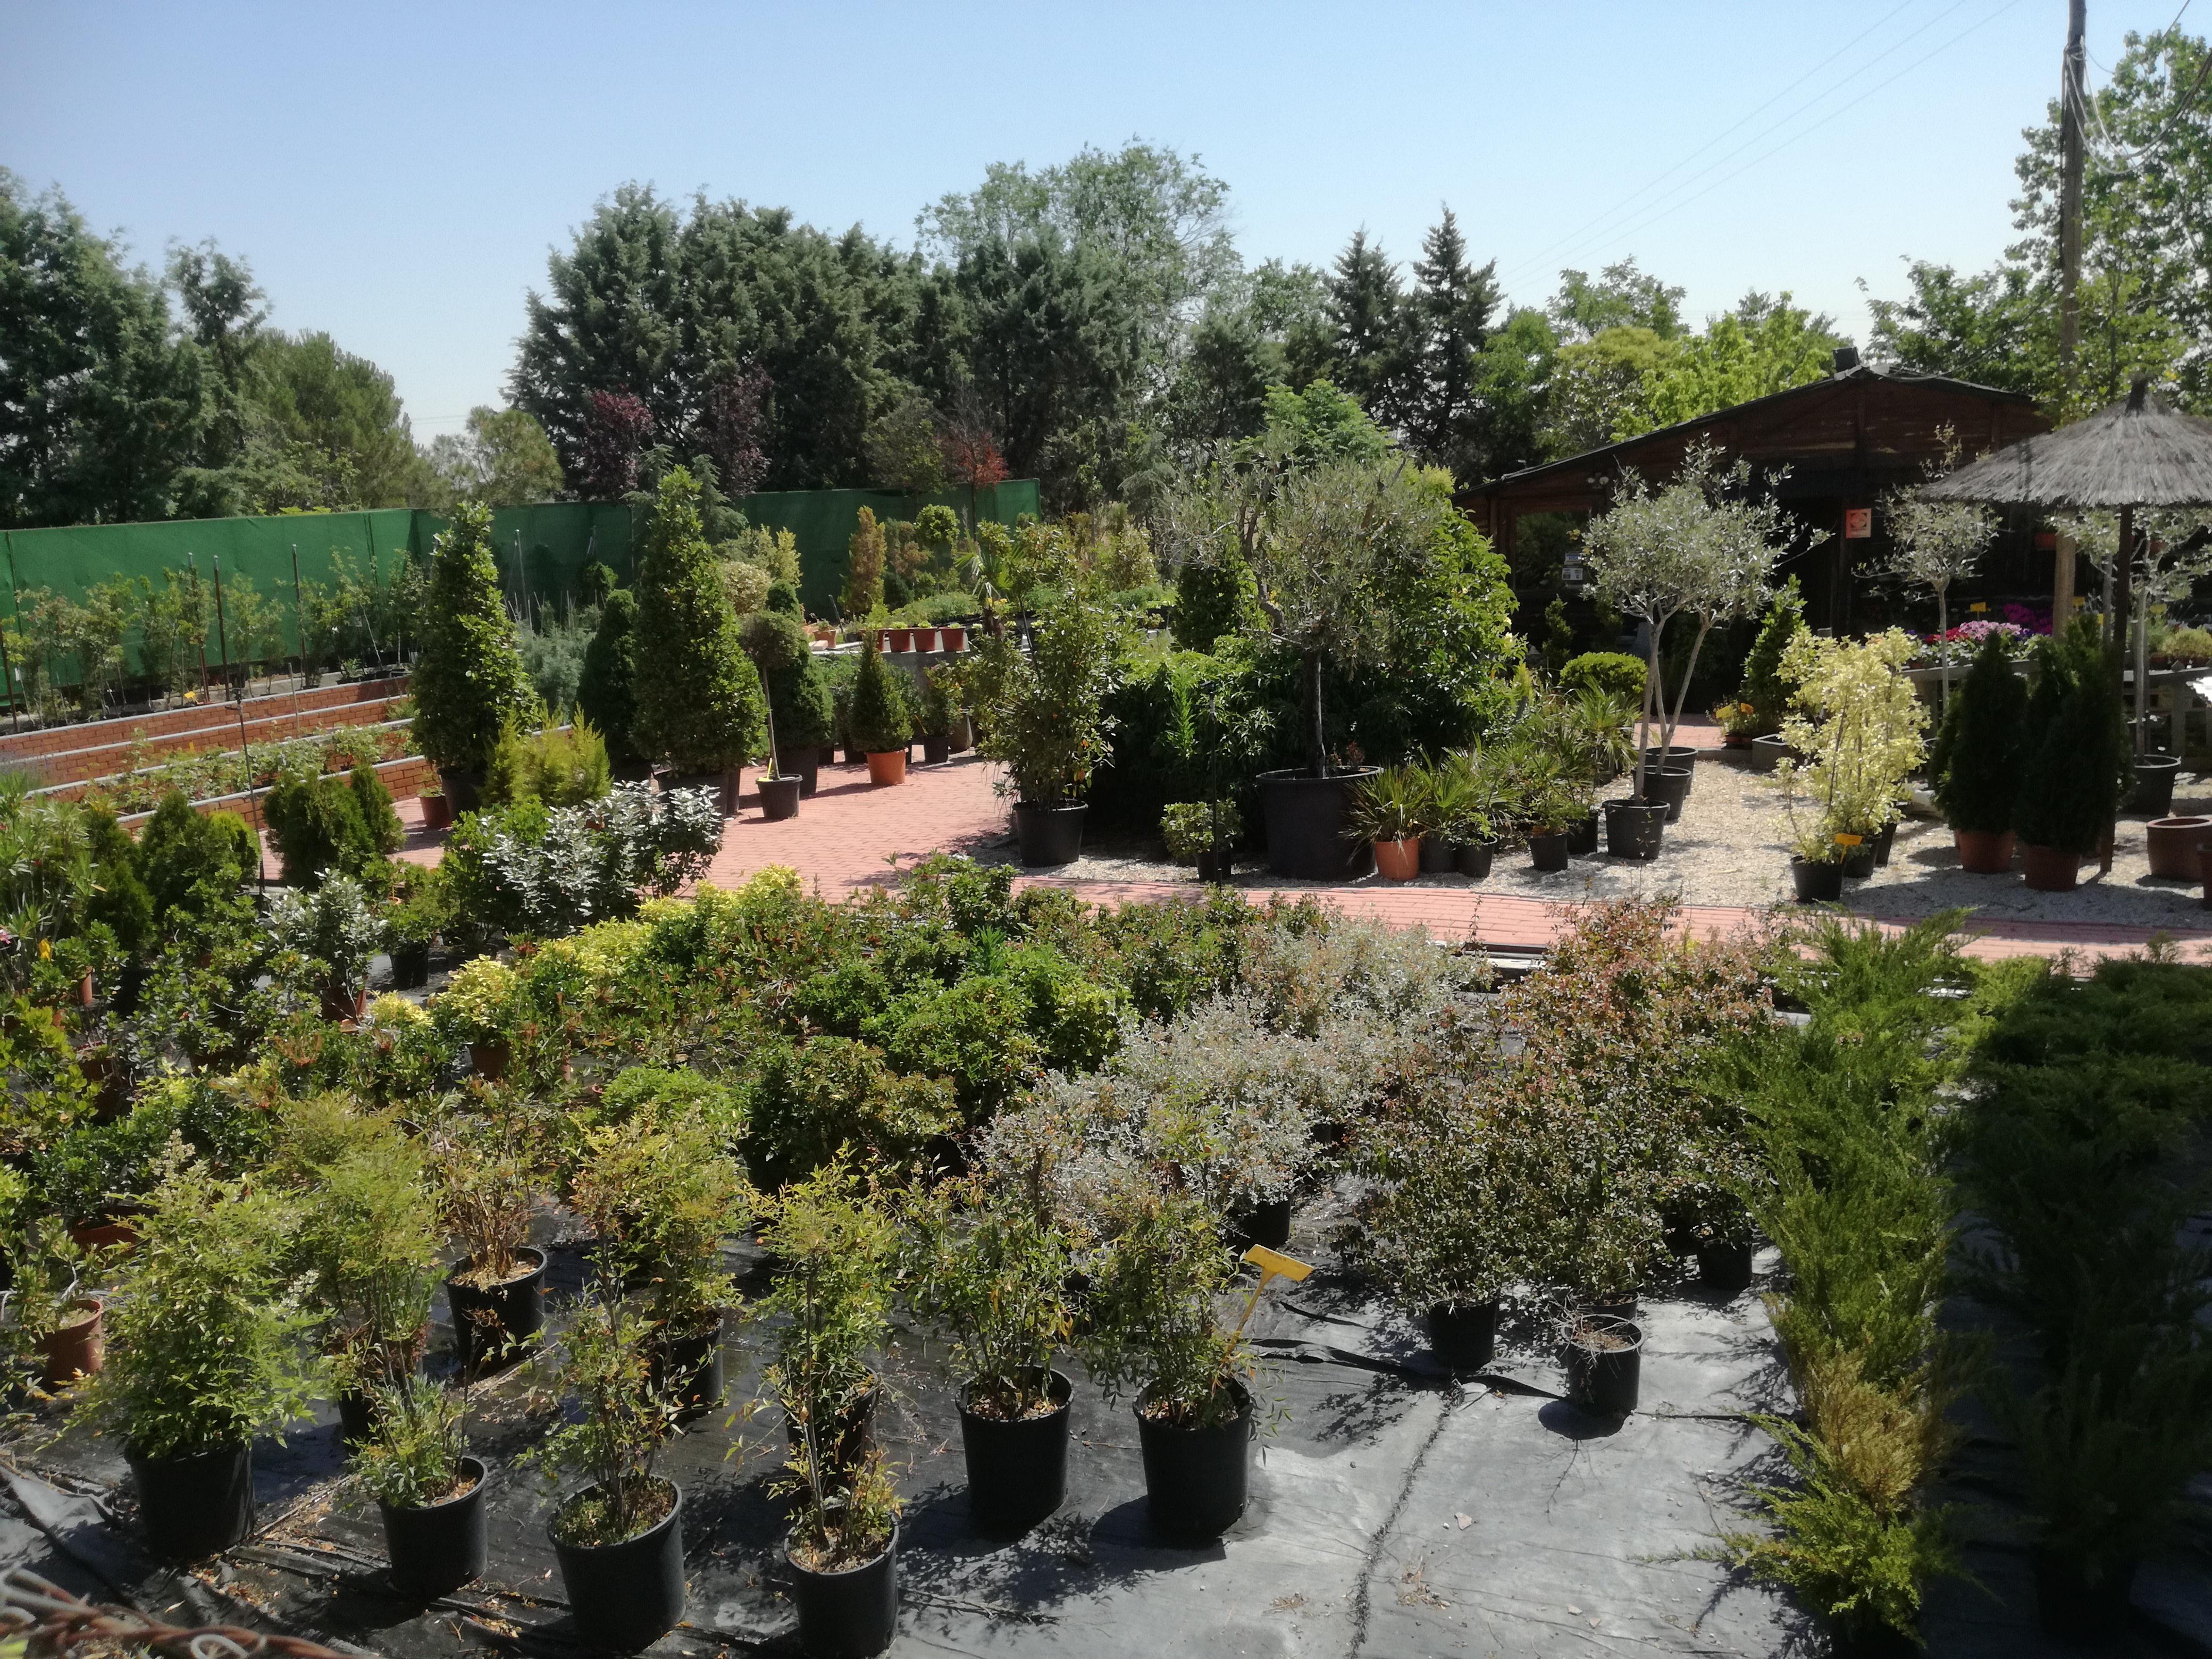 Jard n c sped centro de jardiner a en brunete for Centros de jardineria en madrid